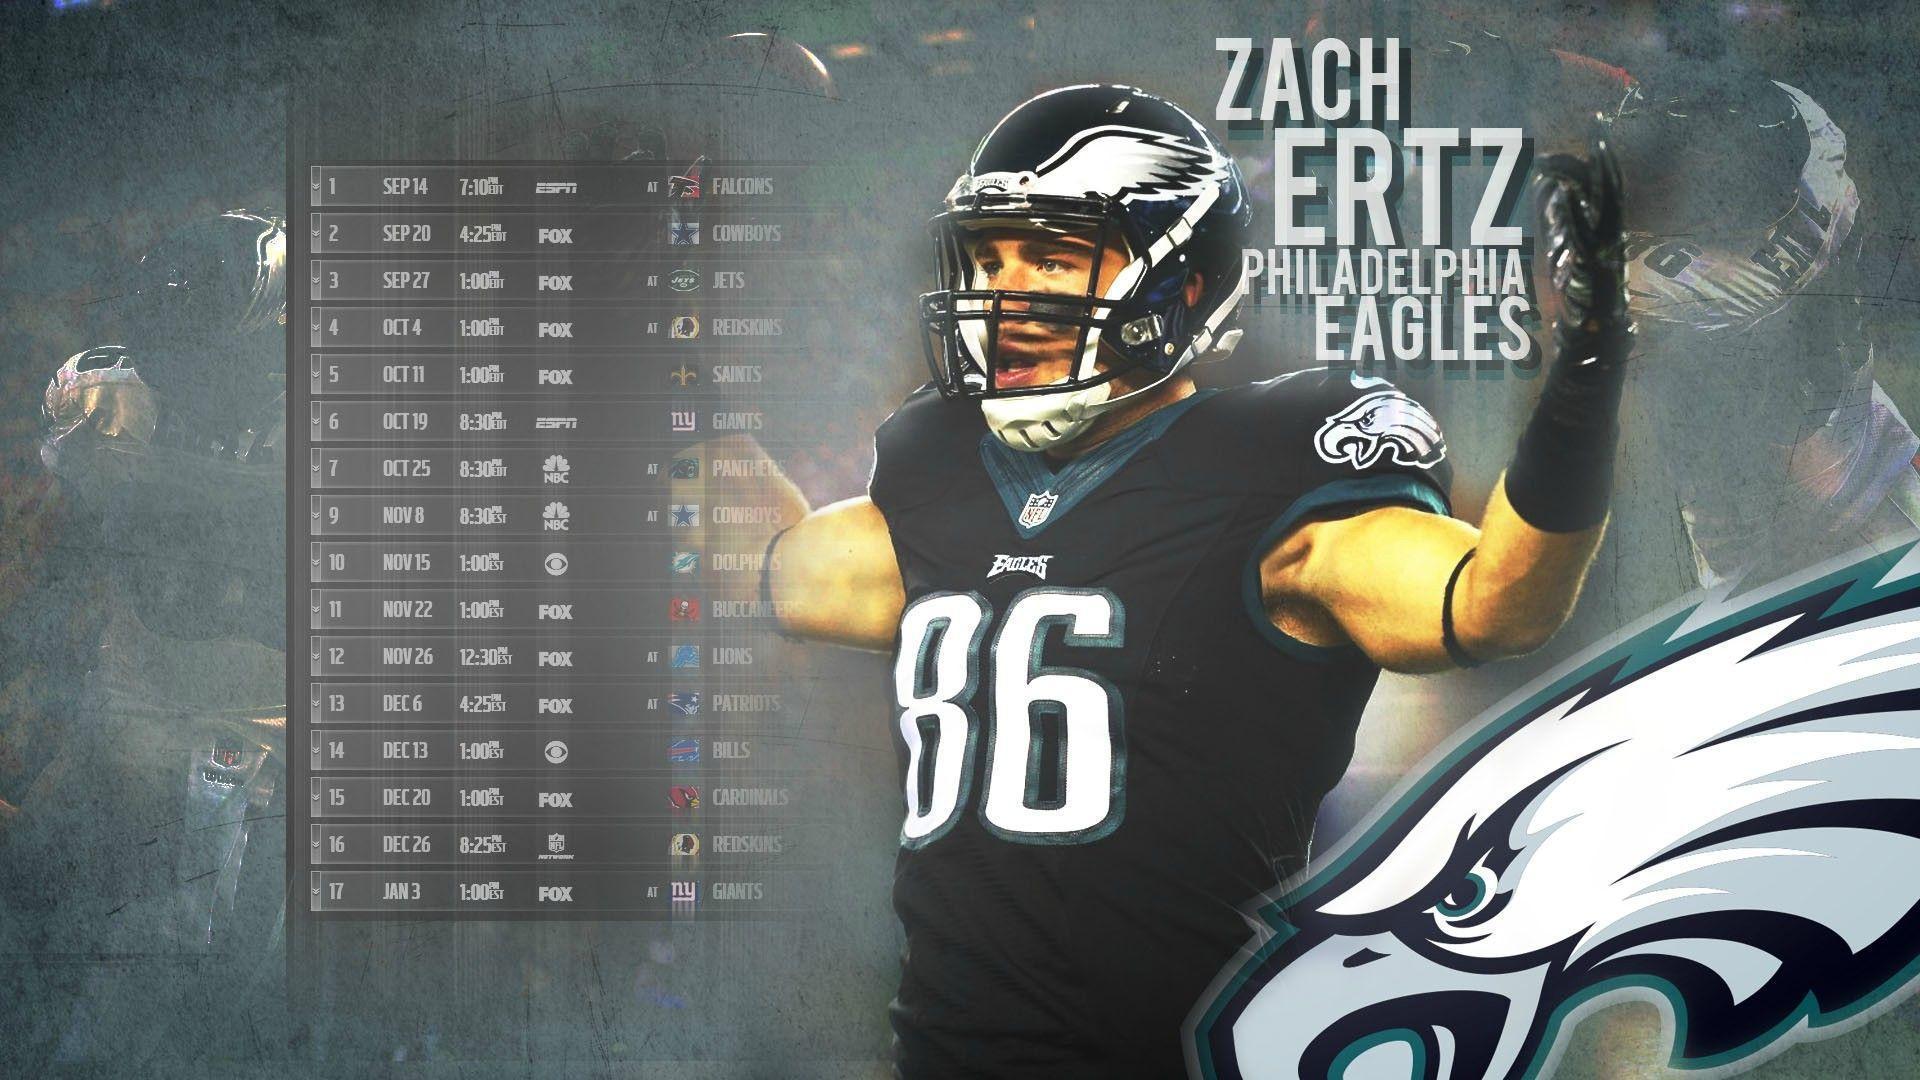 Philadelphia Eagles 2016 Schedule Released